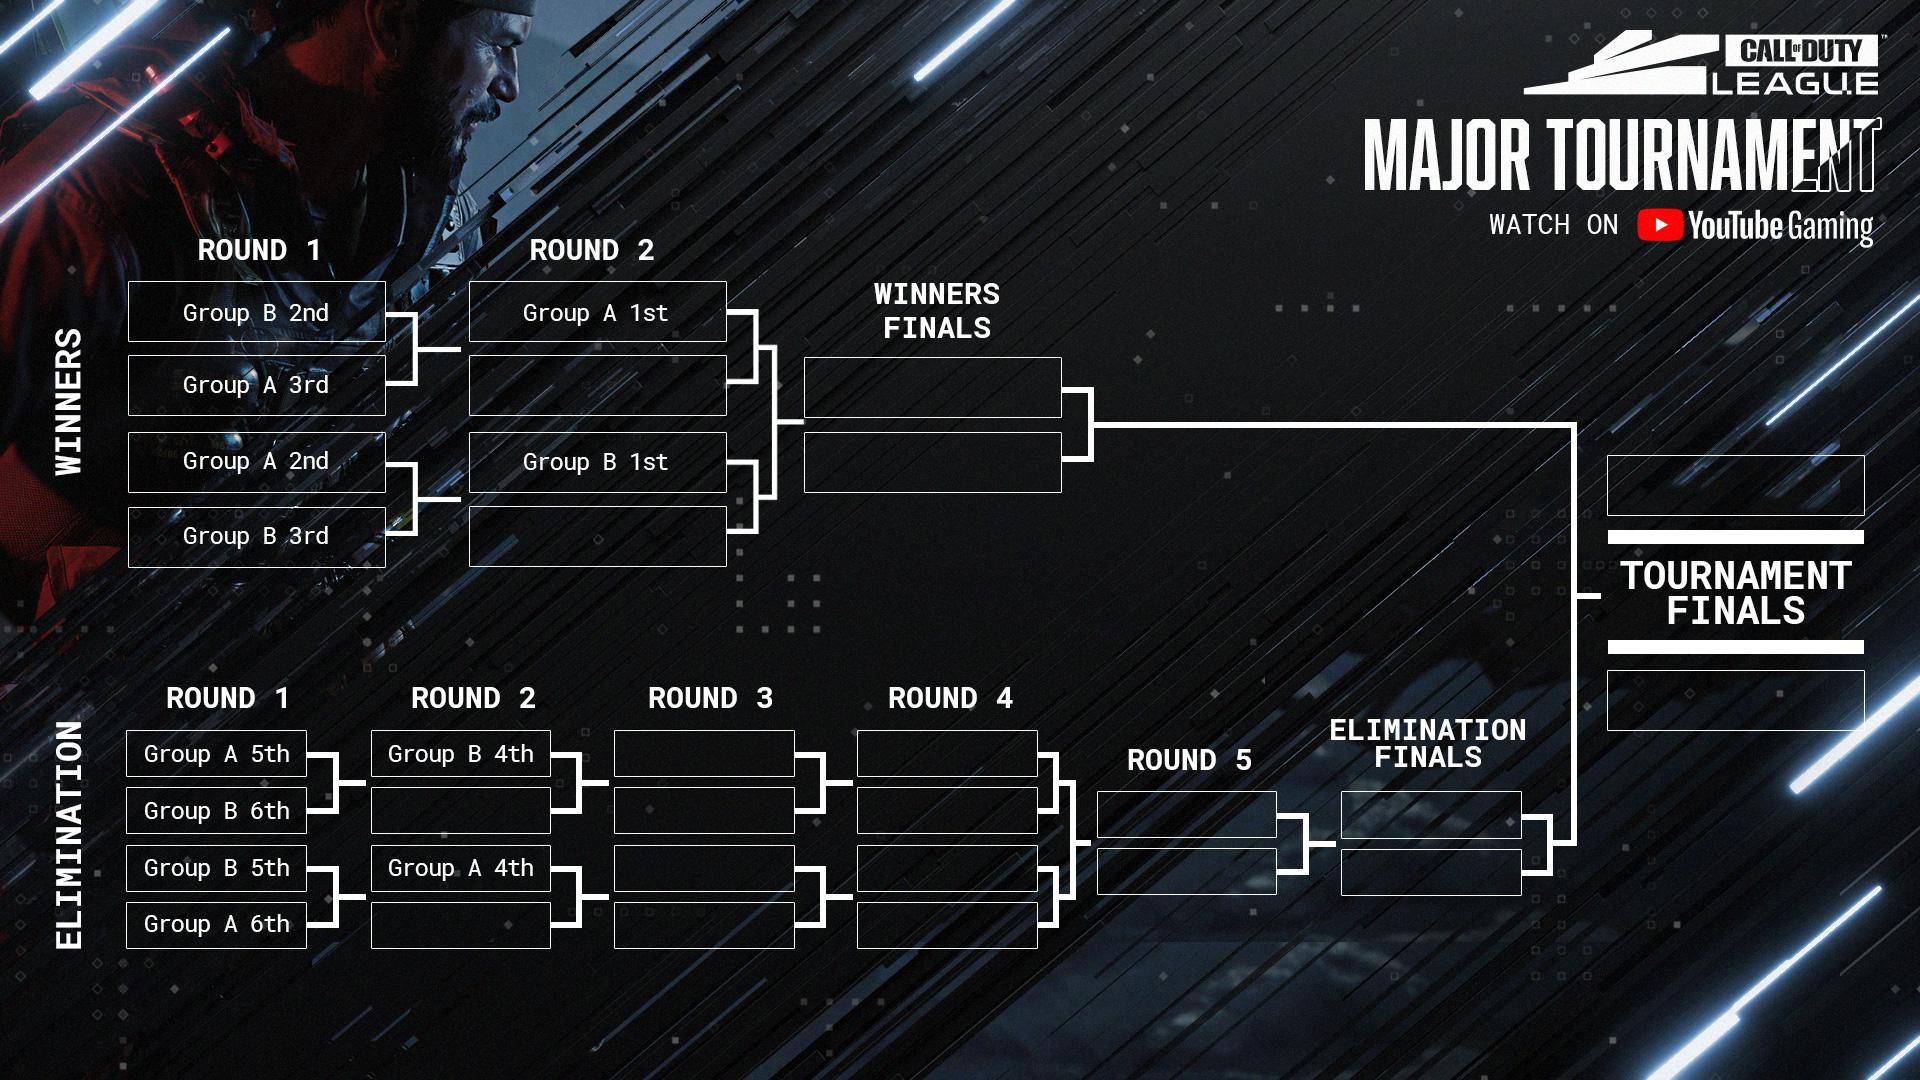 Major Tournament Bracket